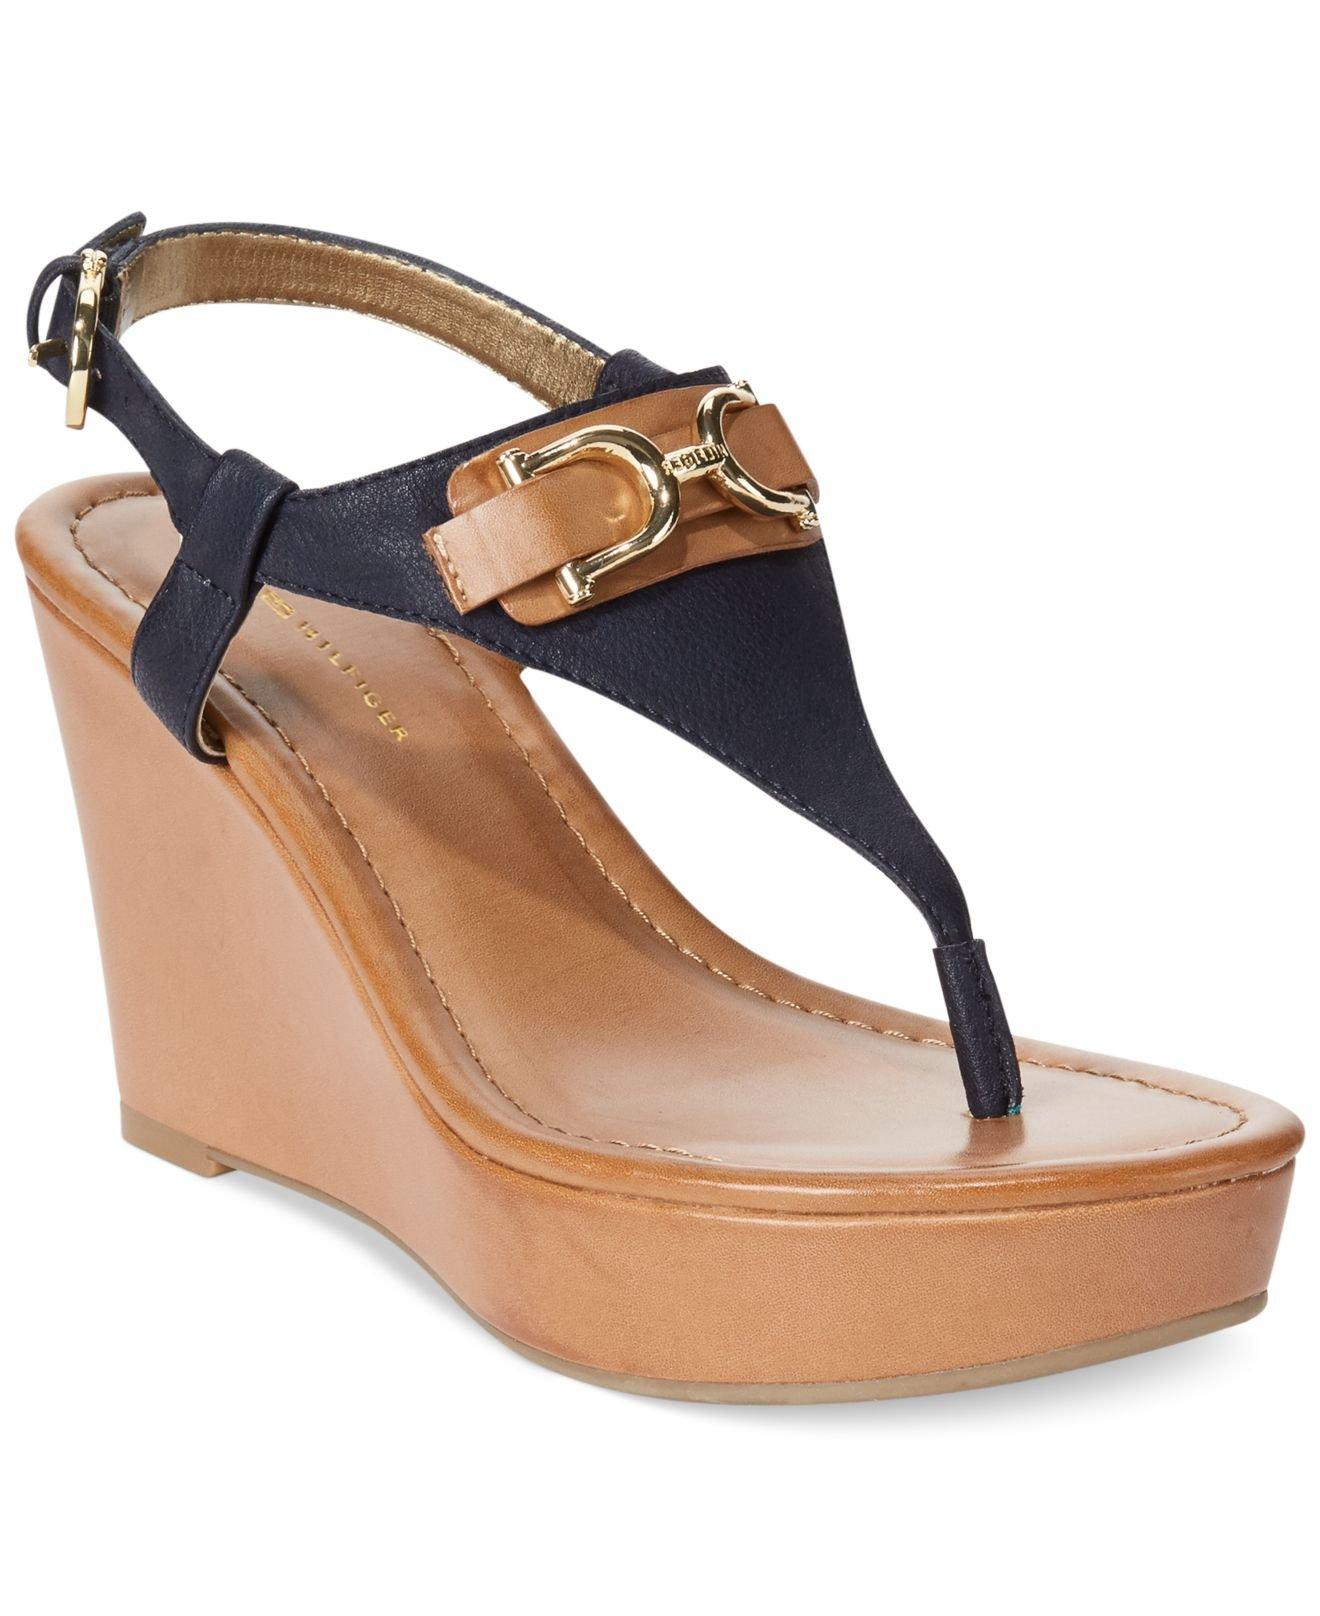 0e11e12a3 Lyst - Tommy Hilfiger Women S Myrtie Platform Wedge Thong Sandals in ...